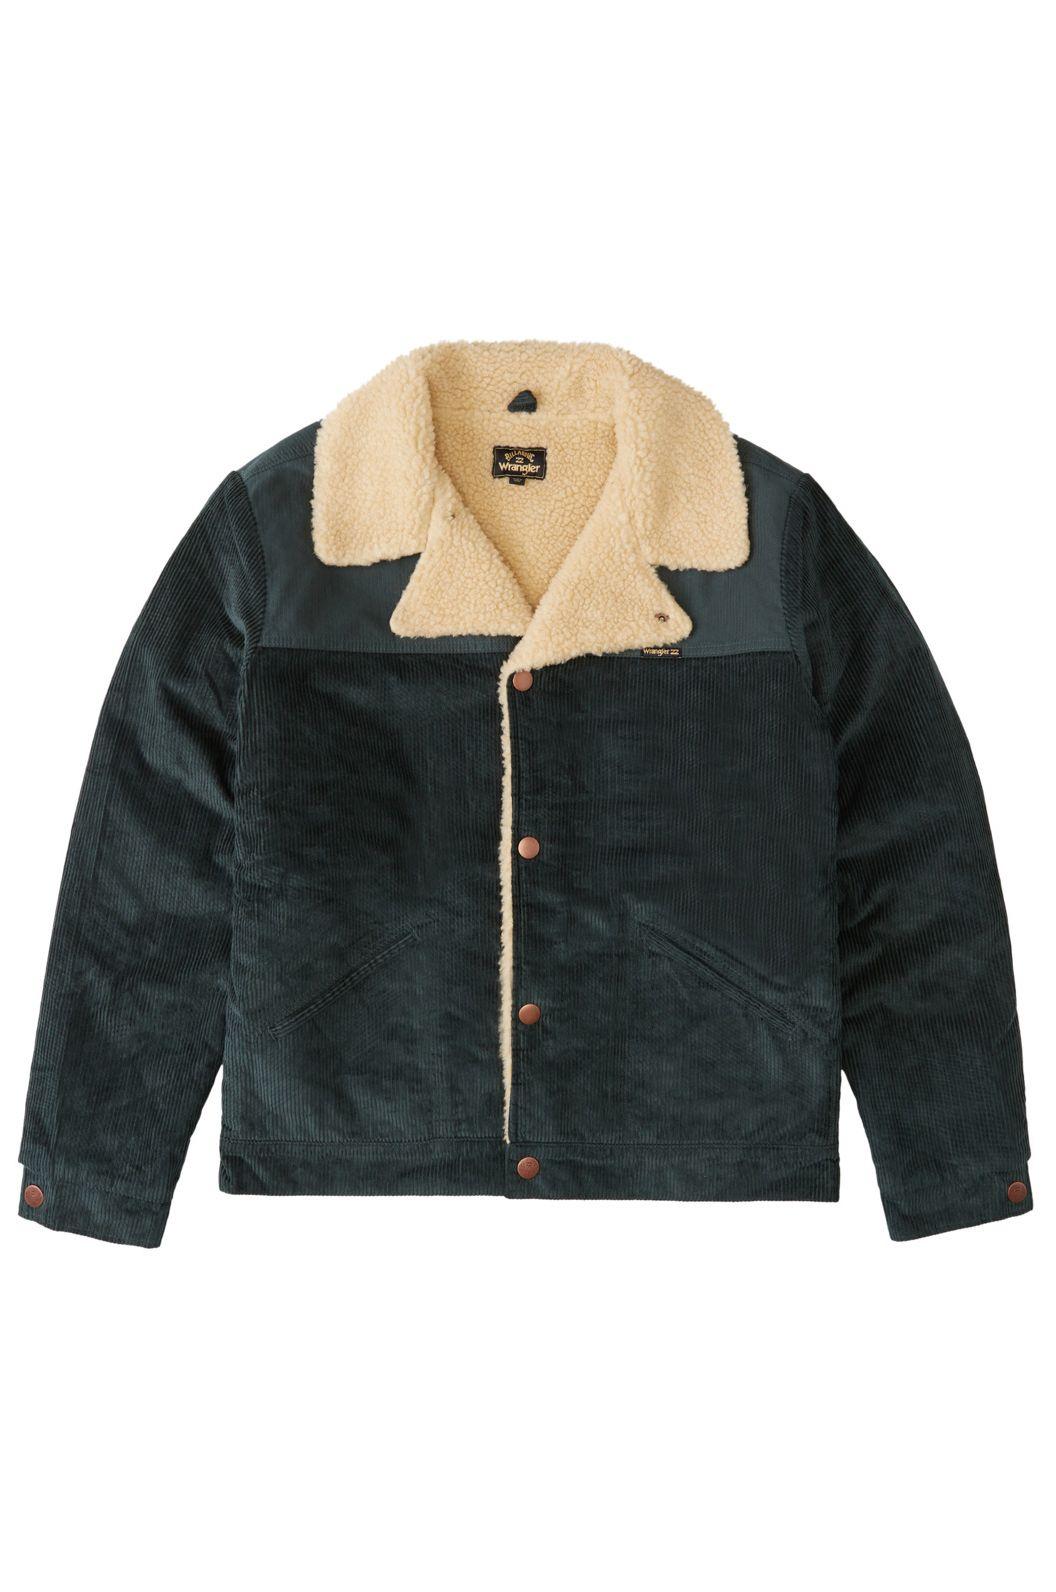 Billabong Jacket RANGE CORD SHERPA JA WRANGLER. Bottle Green